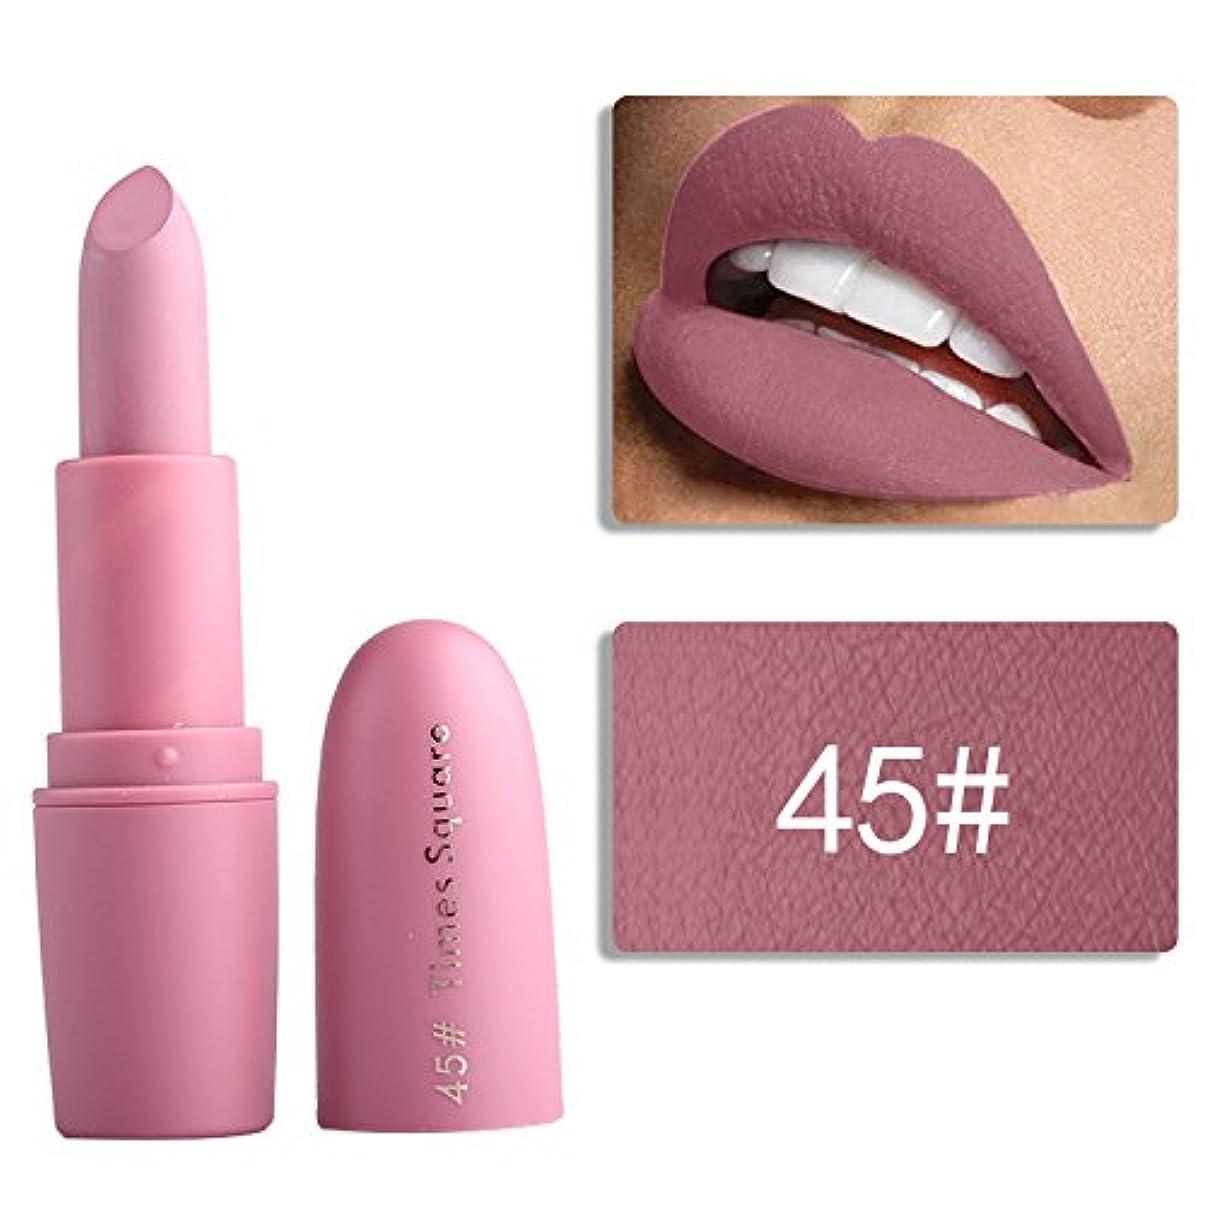 価格小間相互接続Miss Rose Nude Lipstick 22 colors Waterproof Vampire Brown Beauty Baby Lips Batom Matte lipstick Makeup Tats Eugenie...